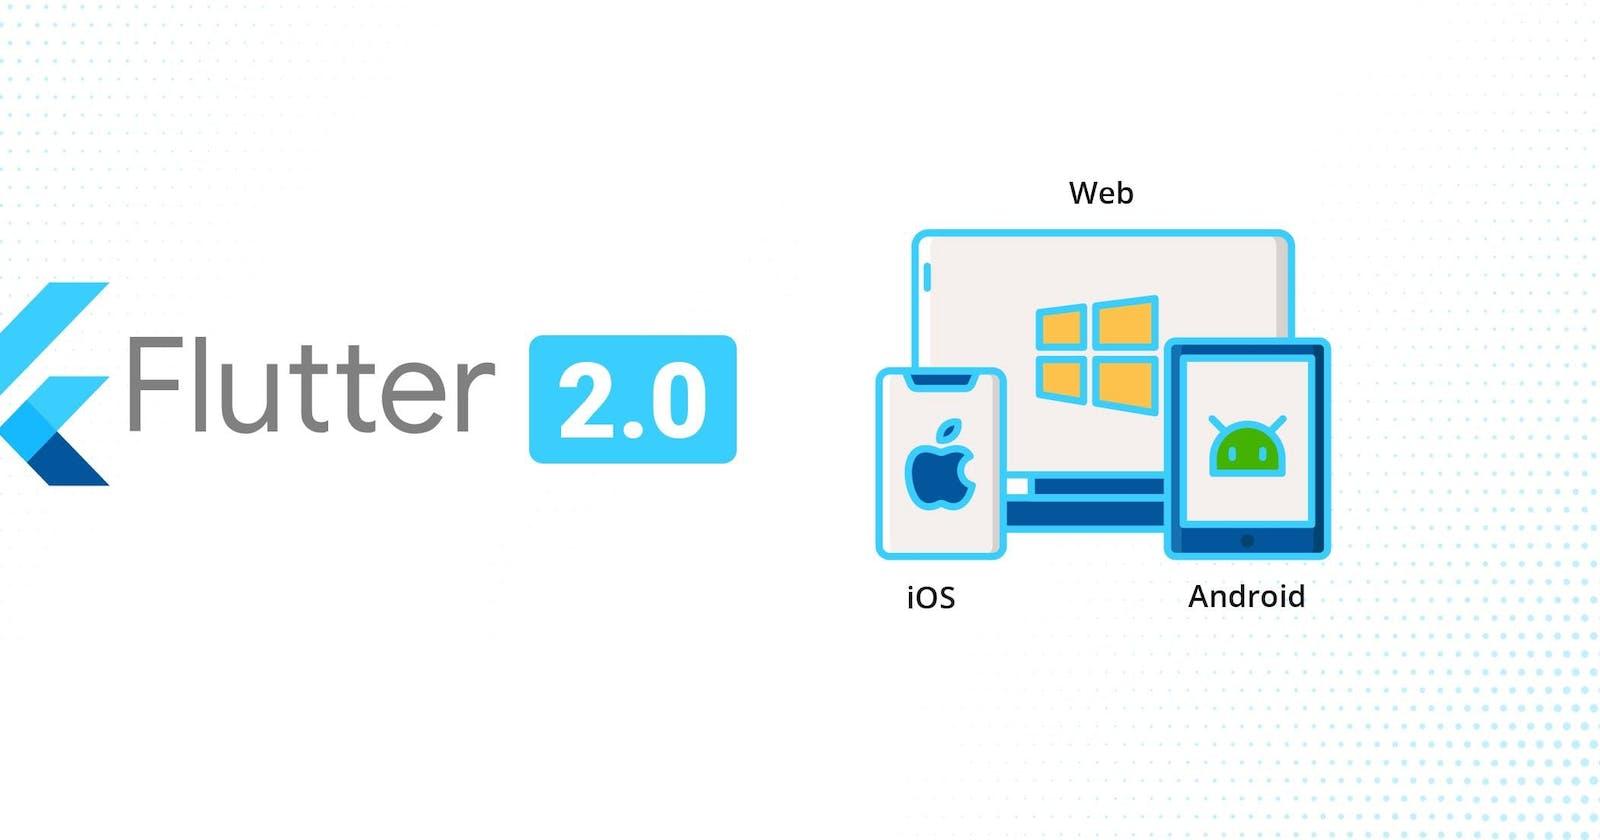 Flutter Web: Should I use it? (Part 1—SEO)